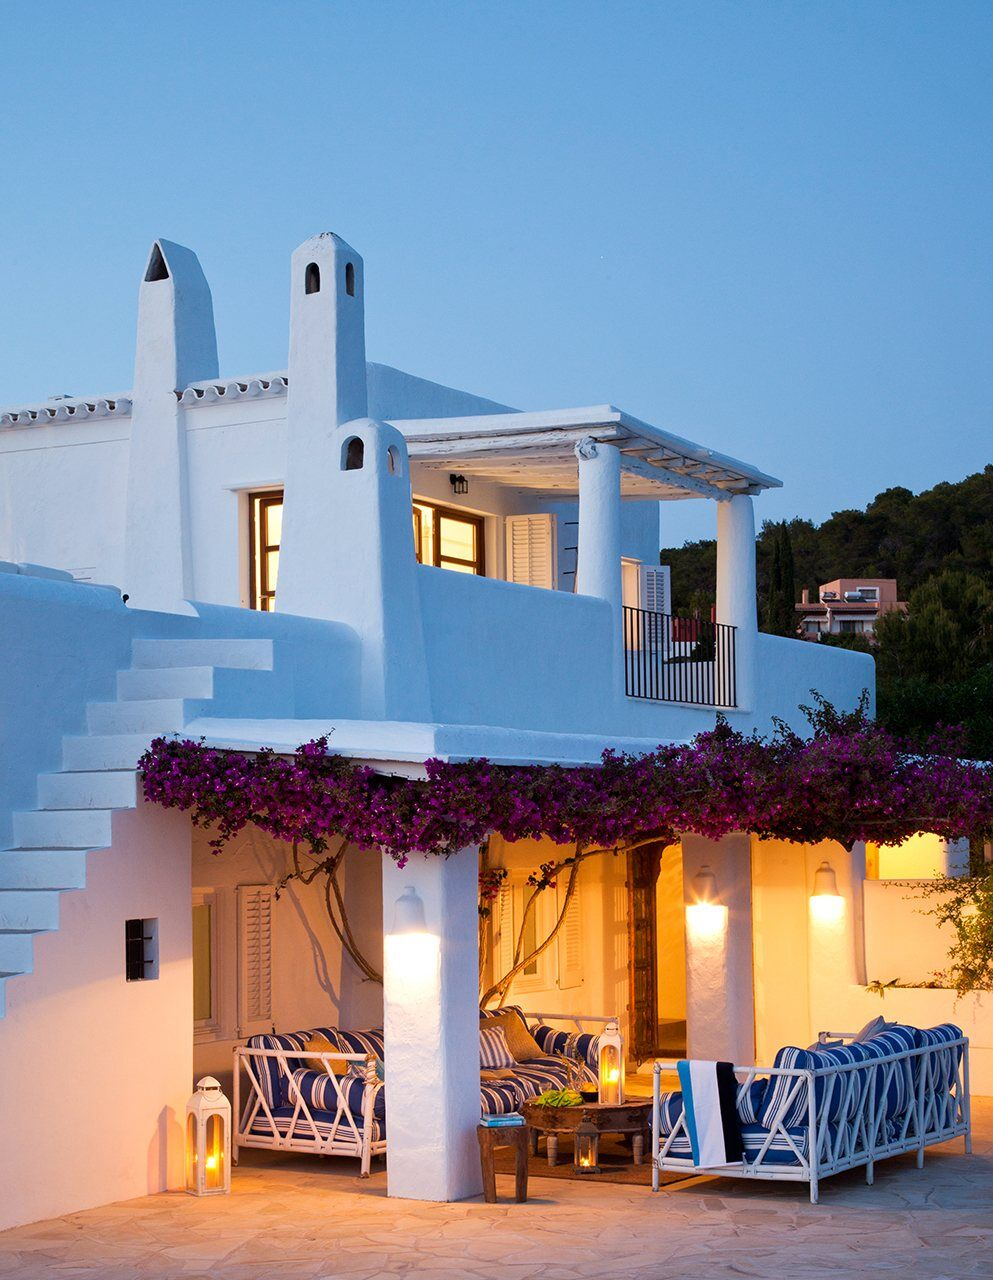 Coastal Decor and Traditional Architecture Under Mediterranean Breeze